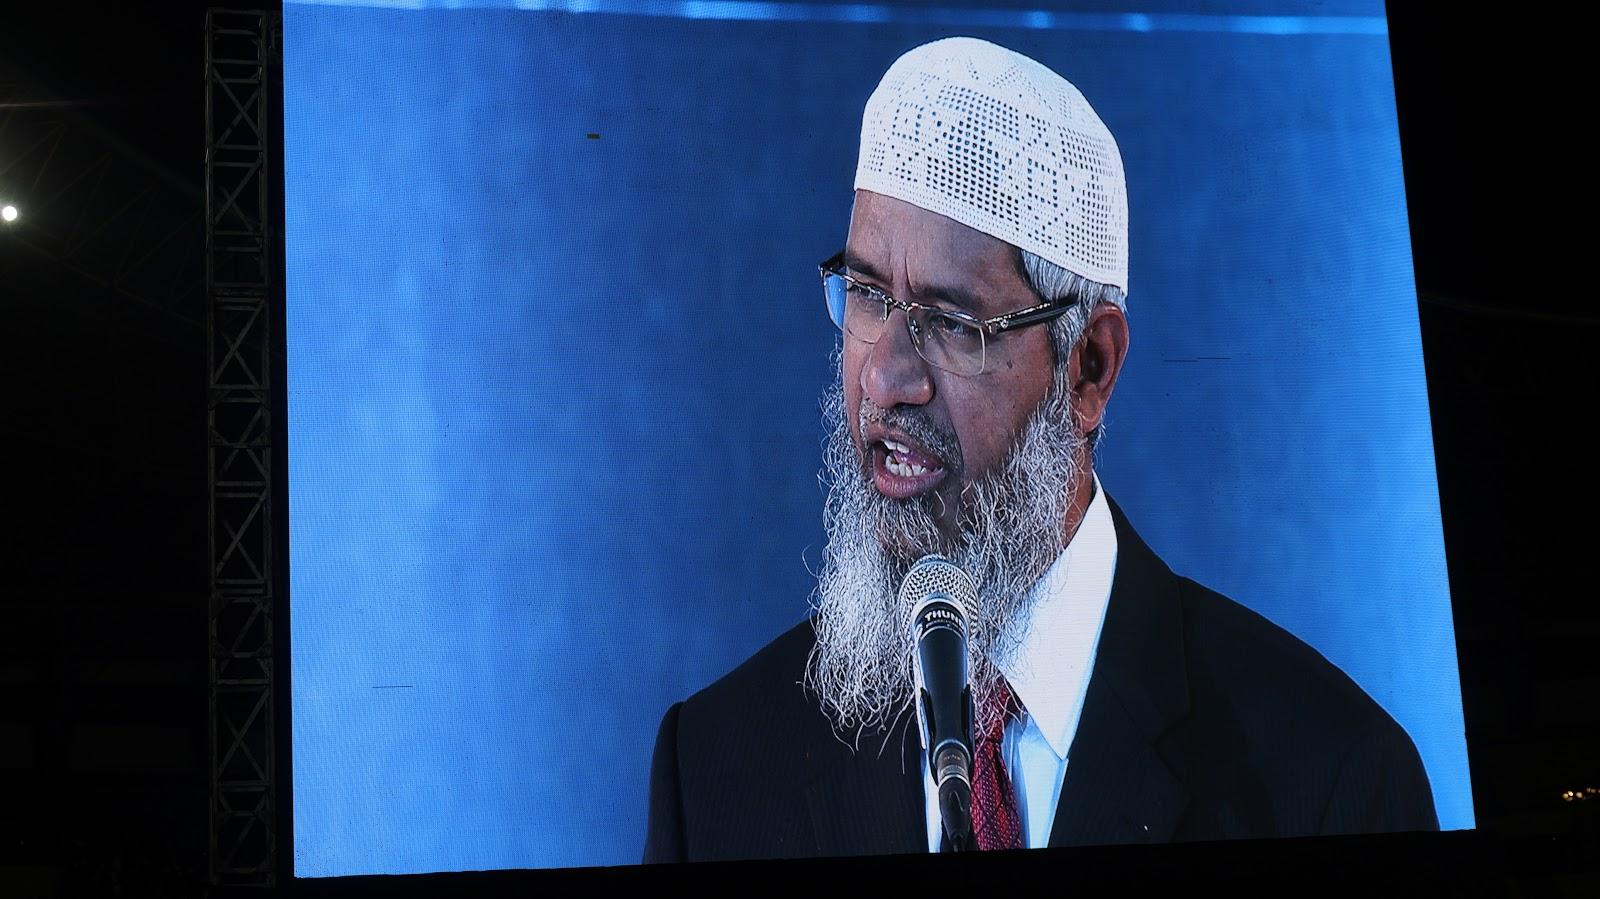 Resmi Sebagai Warga Malaysia, Zakir Naik Pun Dibela